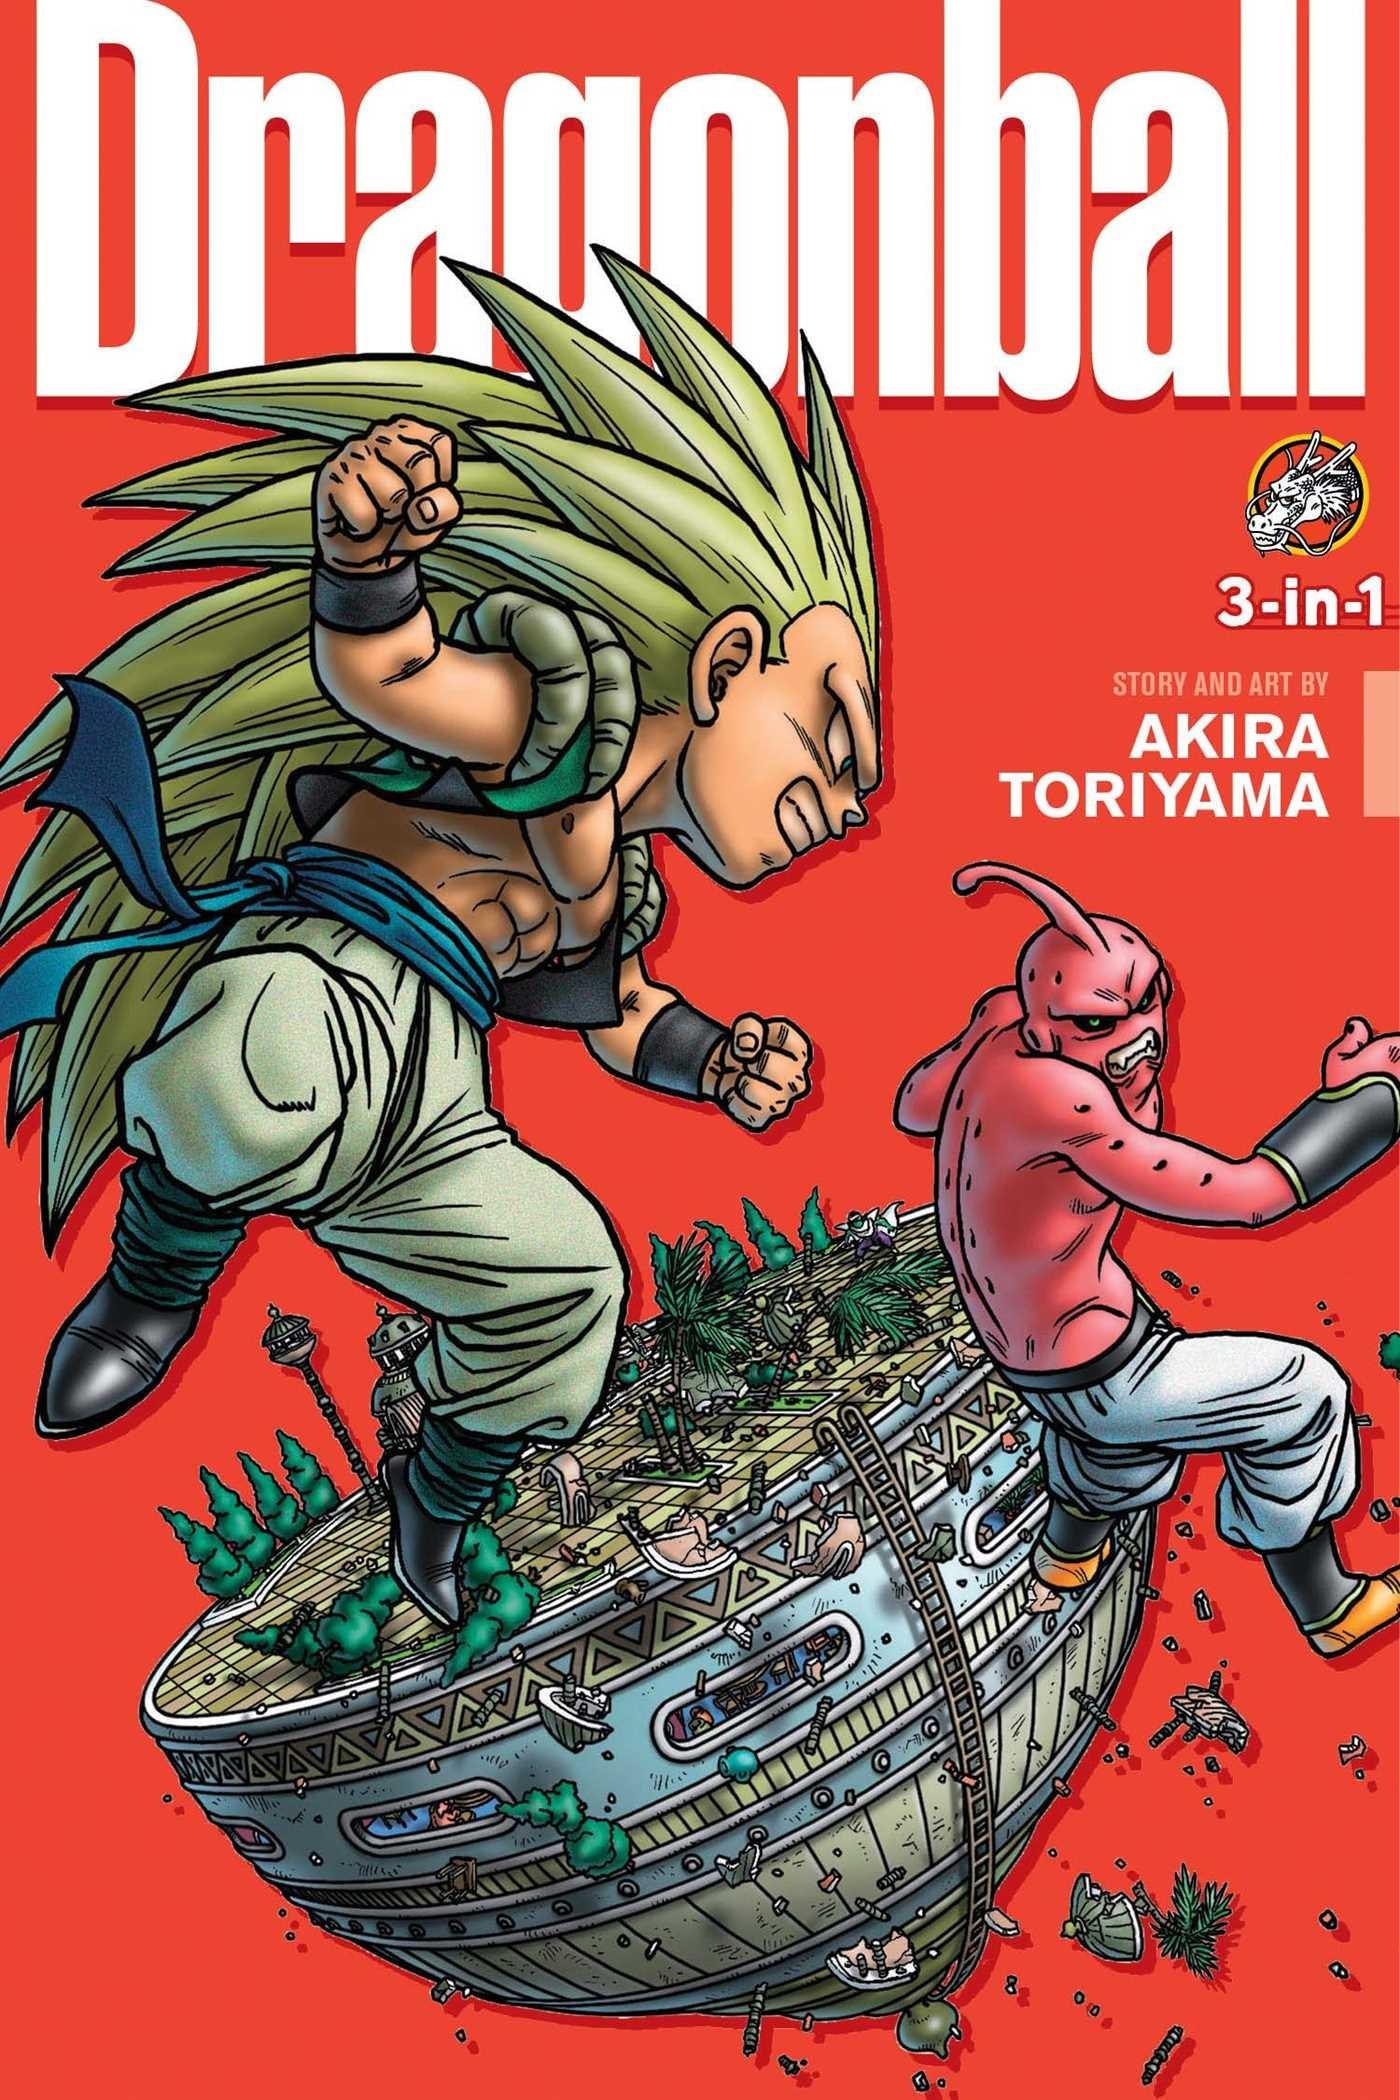 Dragon Ball (3-in-1 Edition), Vol. 14 by Akira Toriyama